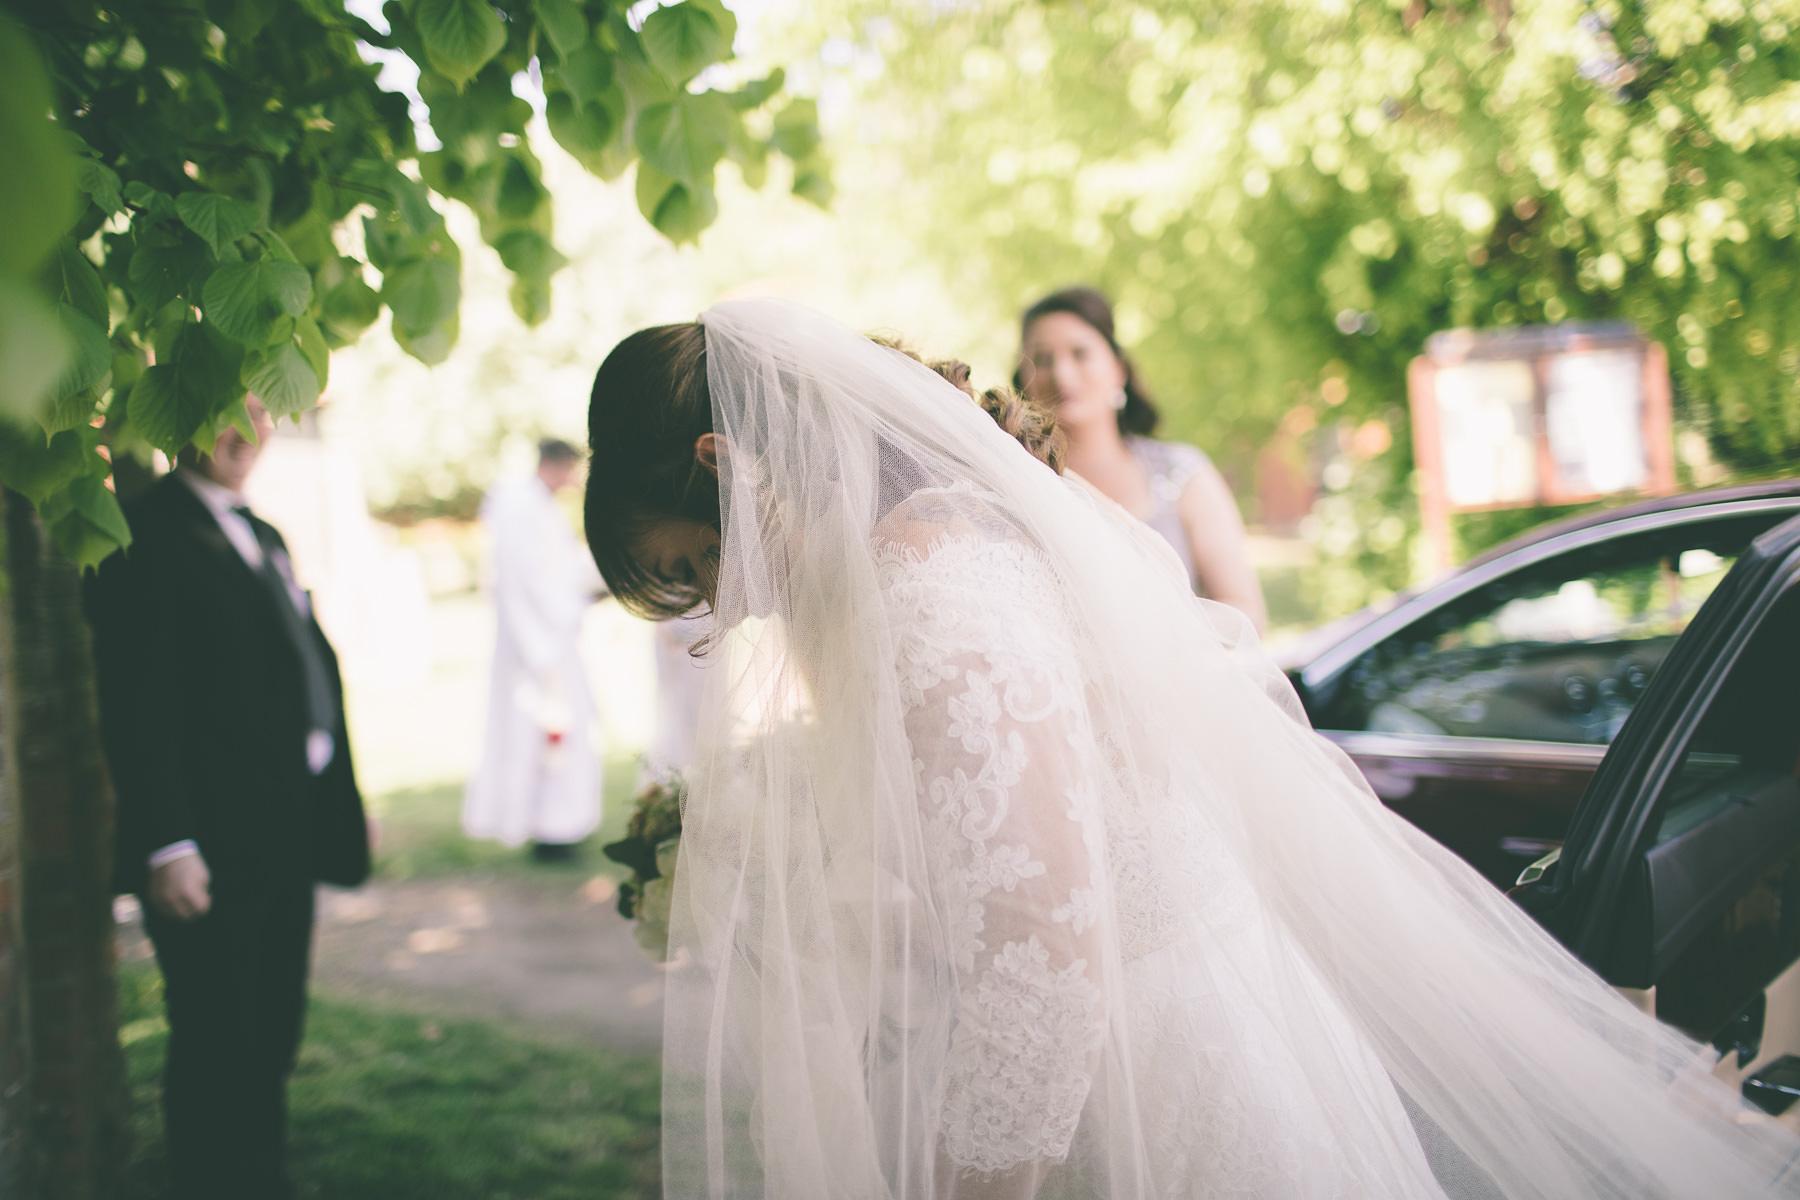 Pamber-Place-wedding-photography-basingstoke-hampshire-143